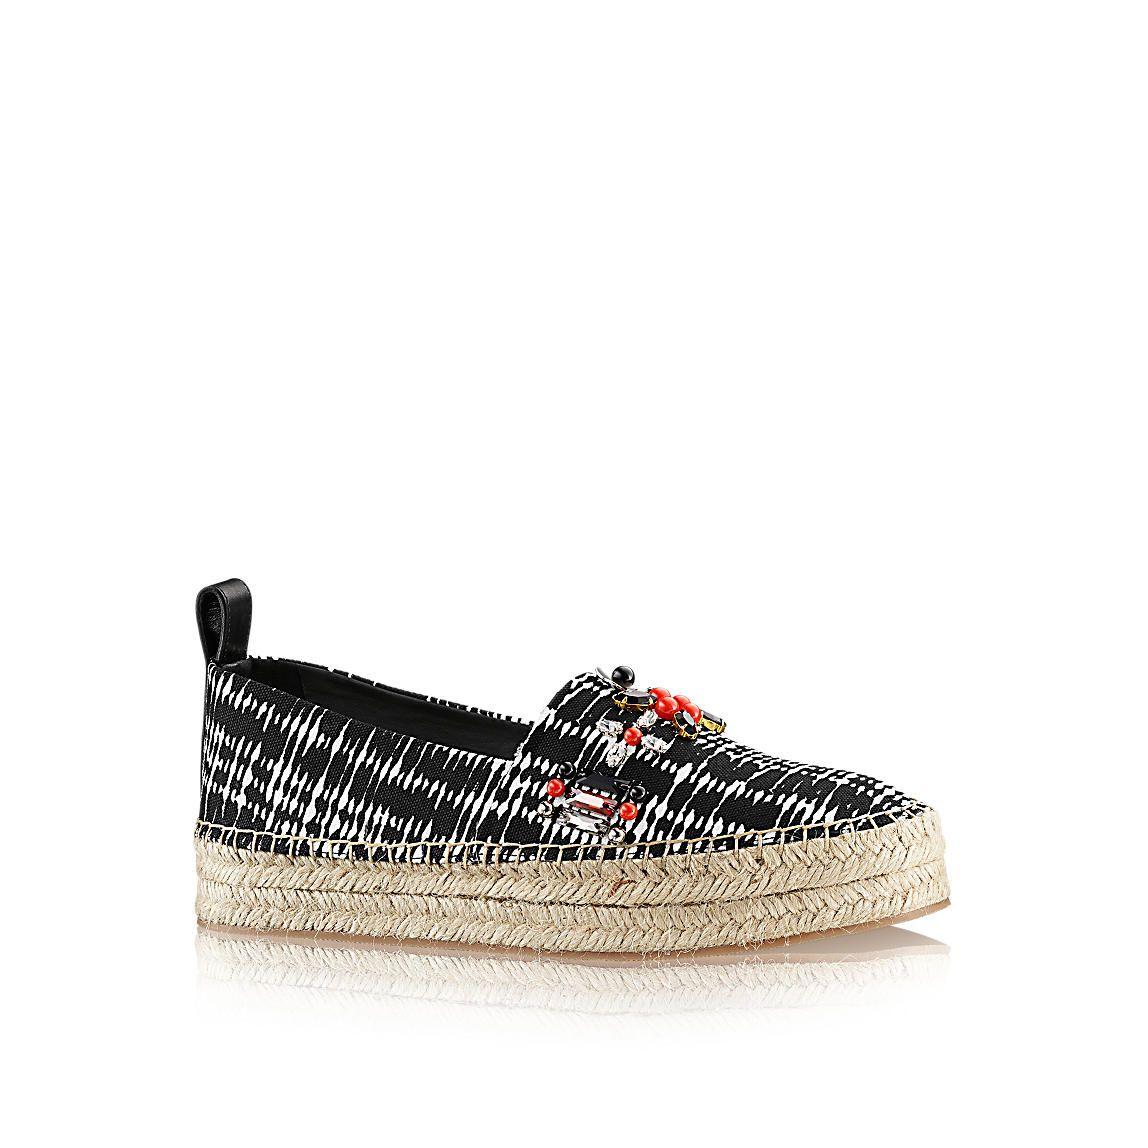 893d08057854ba Louis Vuitton black and white print and flower embellished platform  espadrille Espadrille Schuhe